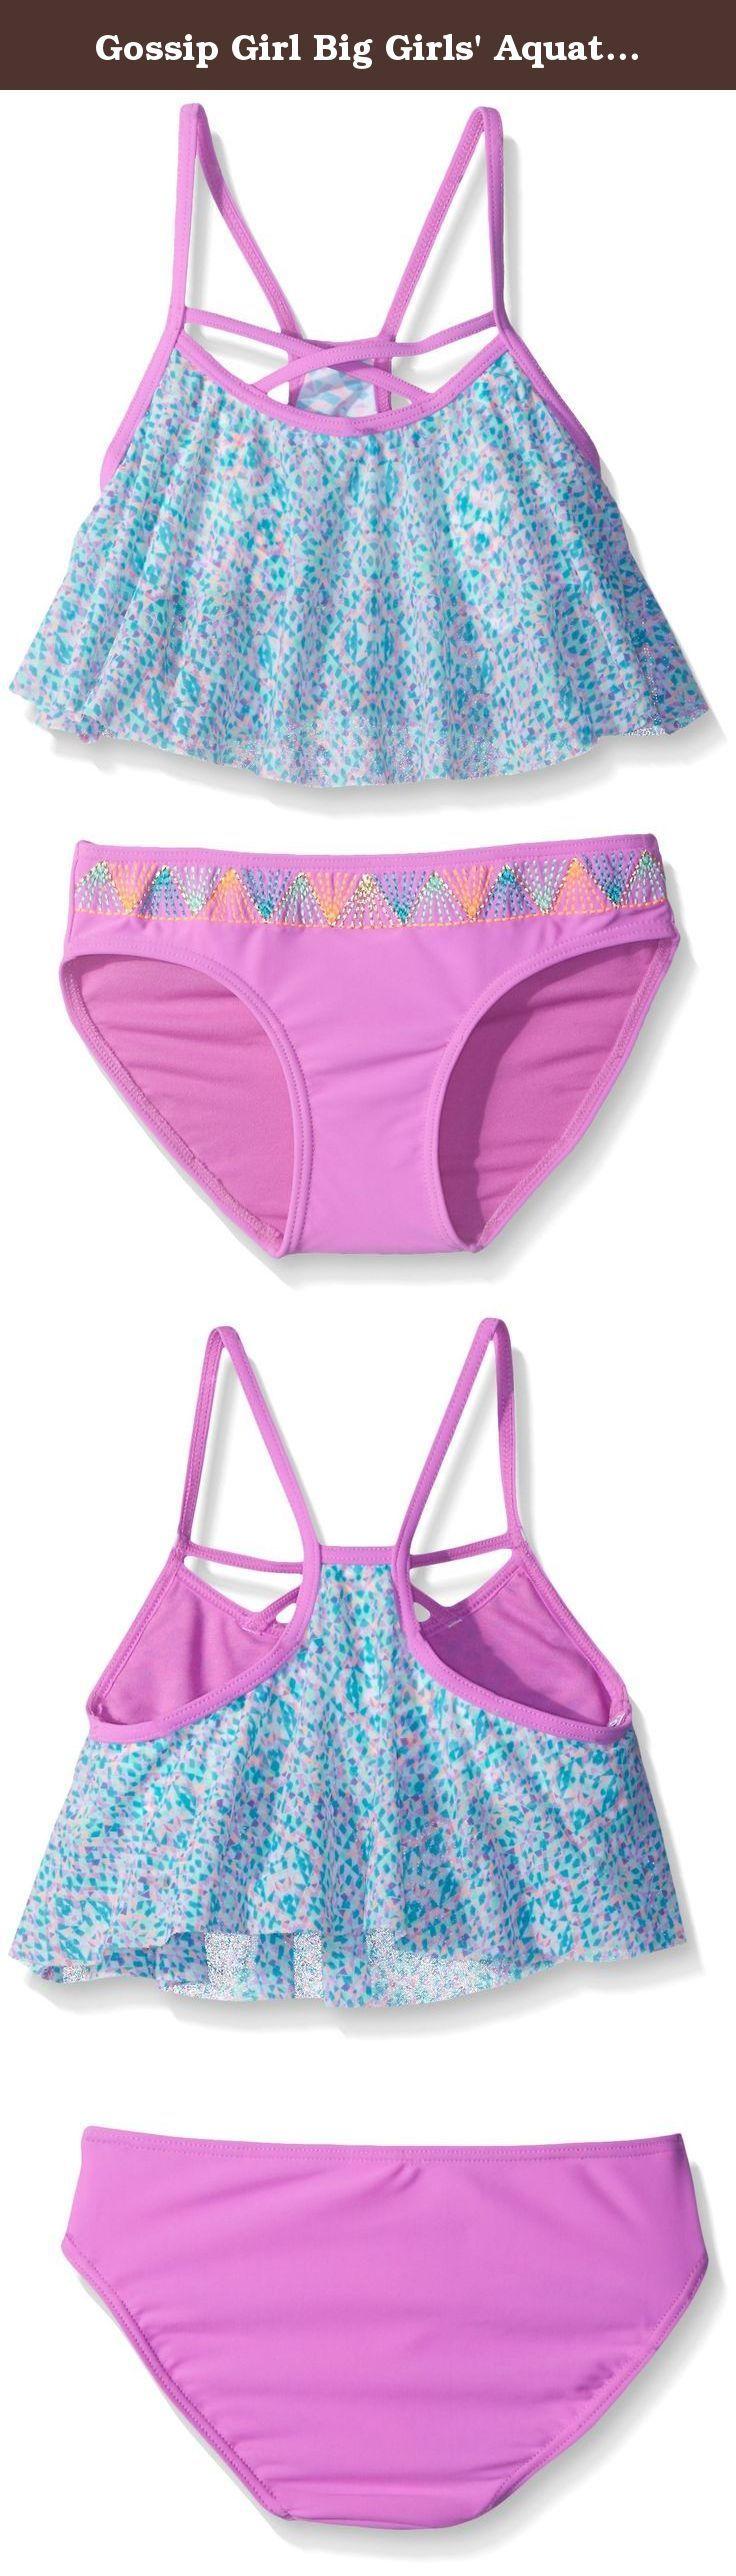 Gossip Girl Big Girls' Aquatic Aztec Two Piece Tankini, Mint/Multi, 14. Traditional swimsuit for 7-16 girls swimwear 2 piece flounce tankini.